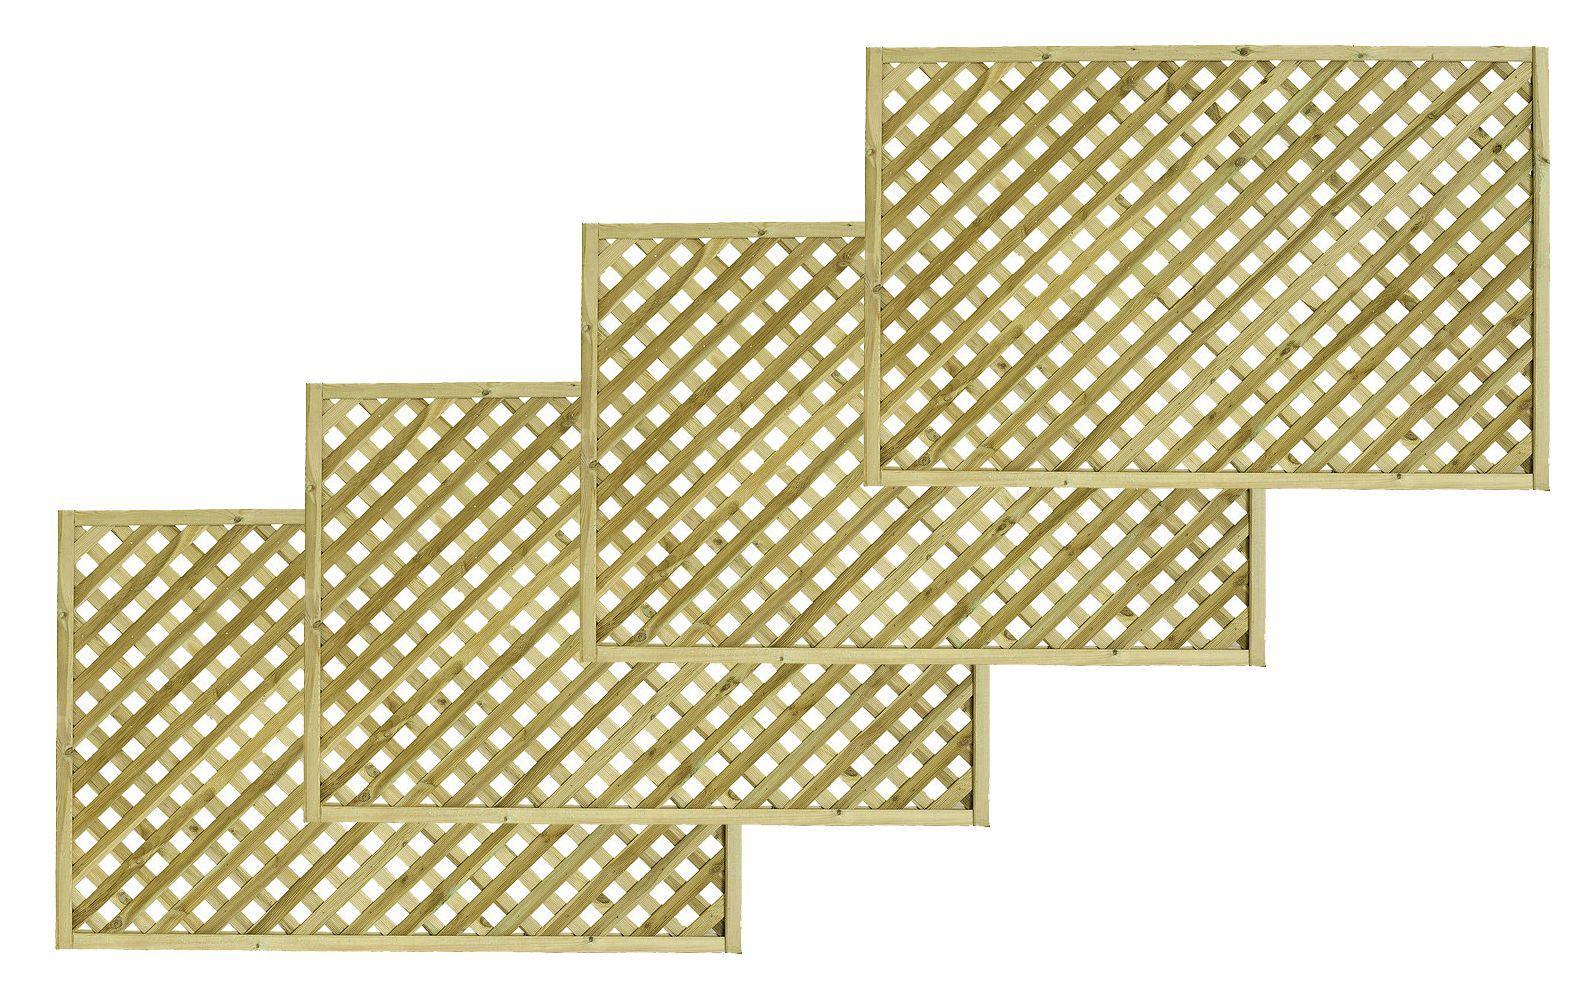 Woodbury Timber Square Trellis Panel (h)1.8m(w)1.2 M, Pack Of 4